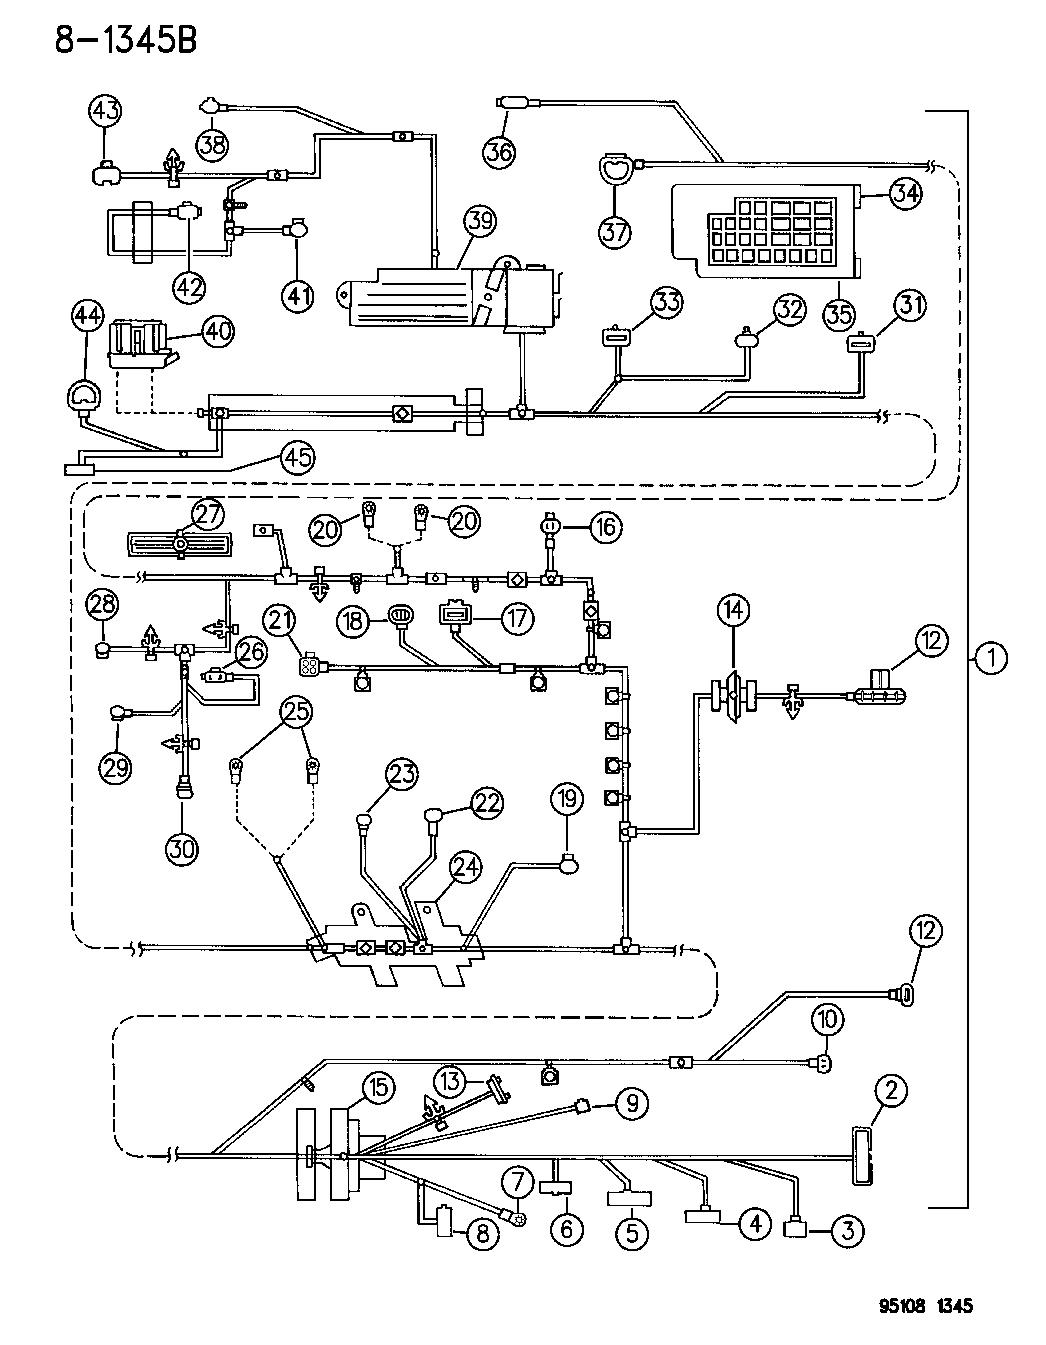 fuse box diagram for 2003 dodge stratus 5915a59 617ed 1995 dodge stratus wiring diagram digital  617ed 1995 dodge stratus wiring diagram